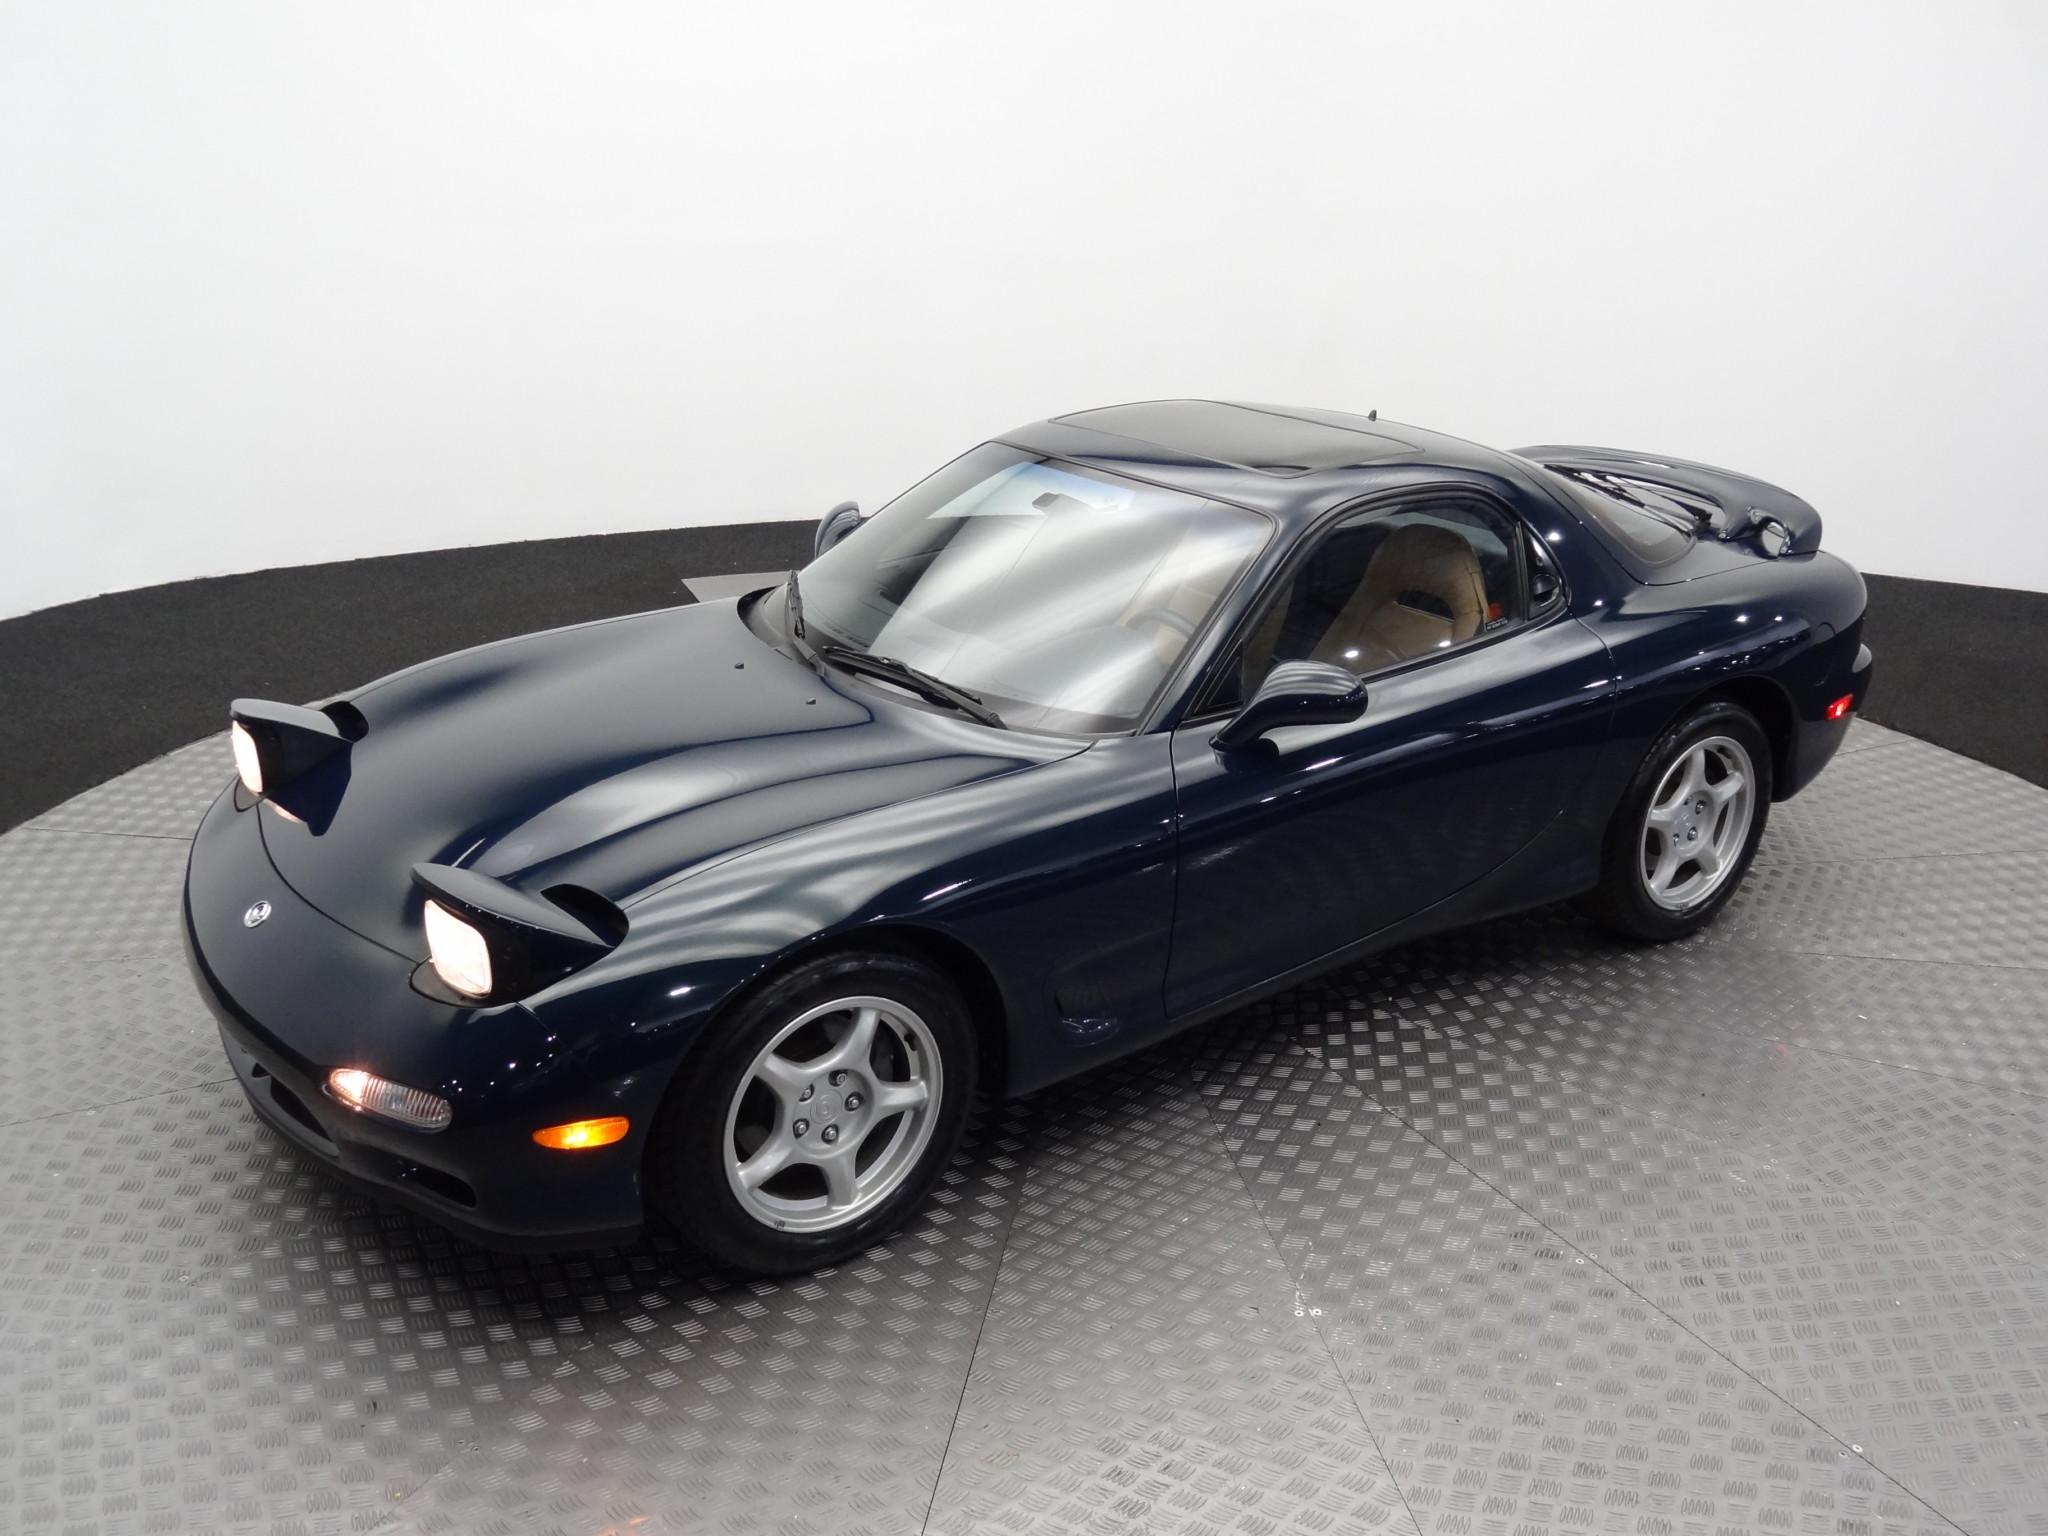 1994 Mazda RX-7 3/4 front lights up